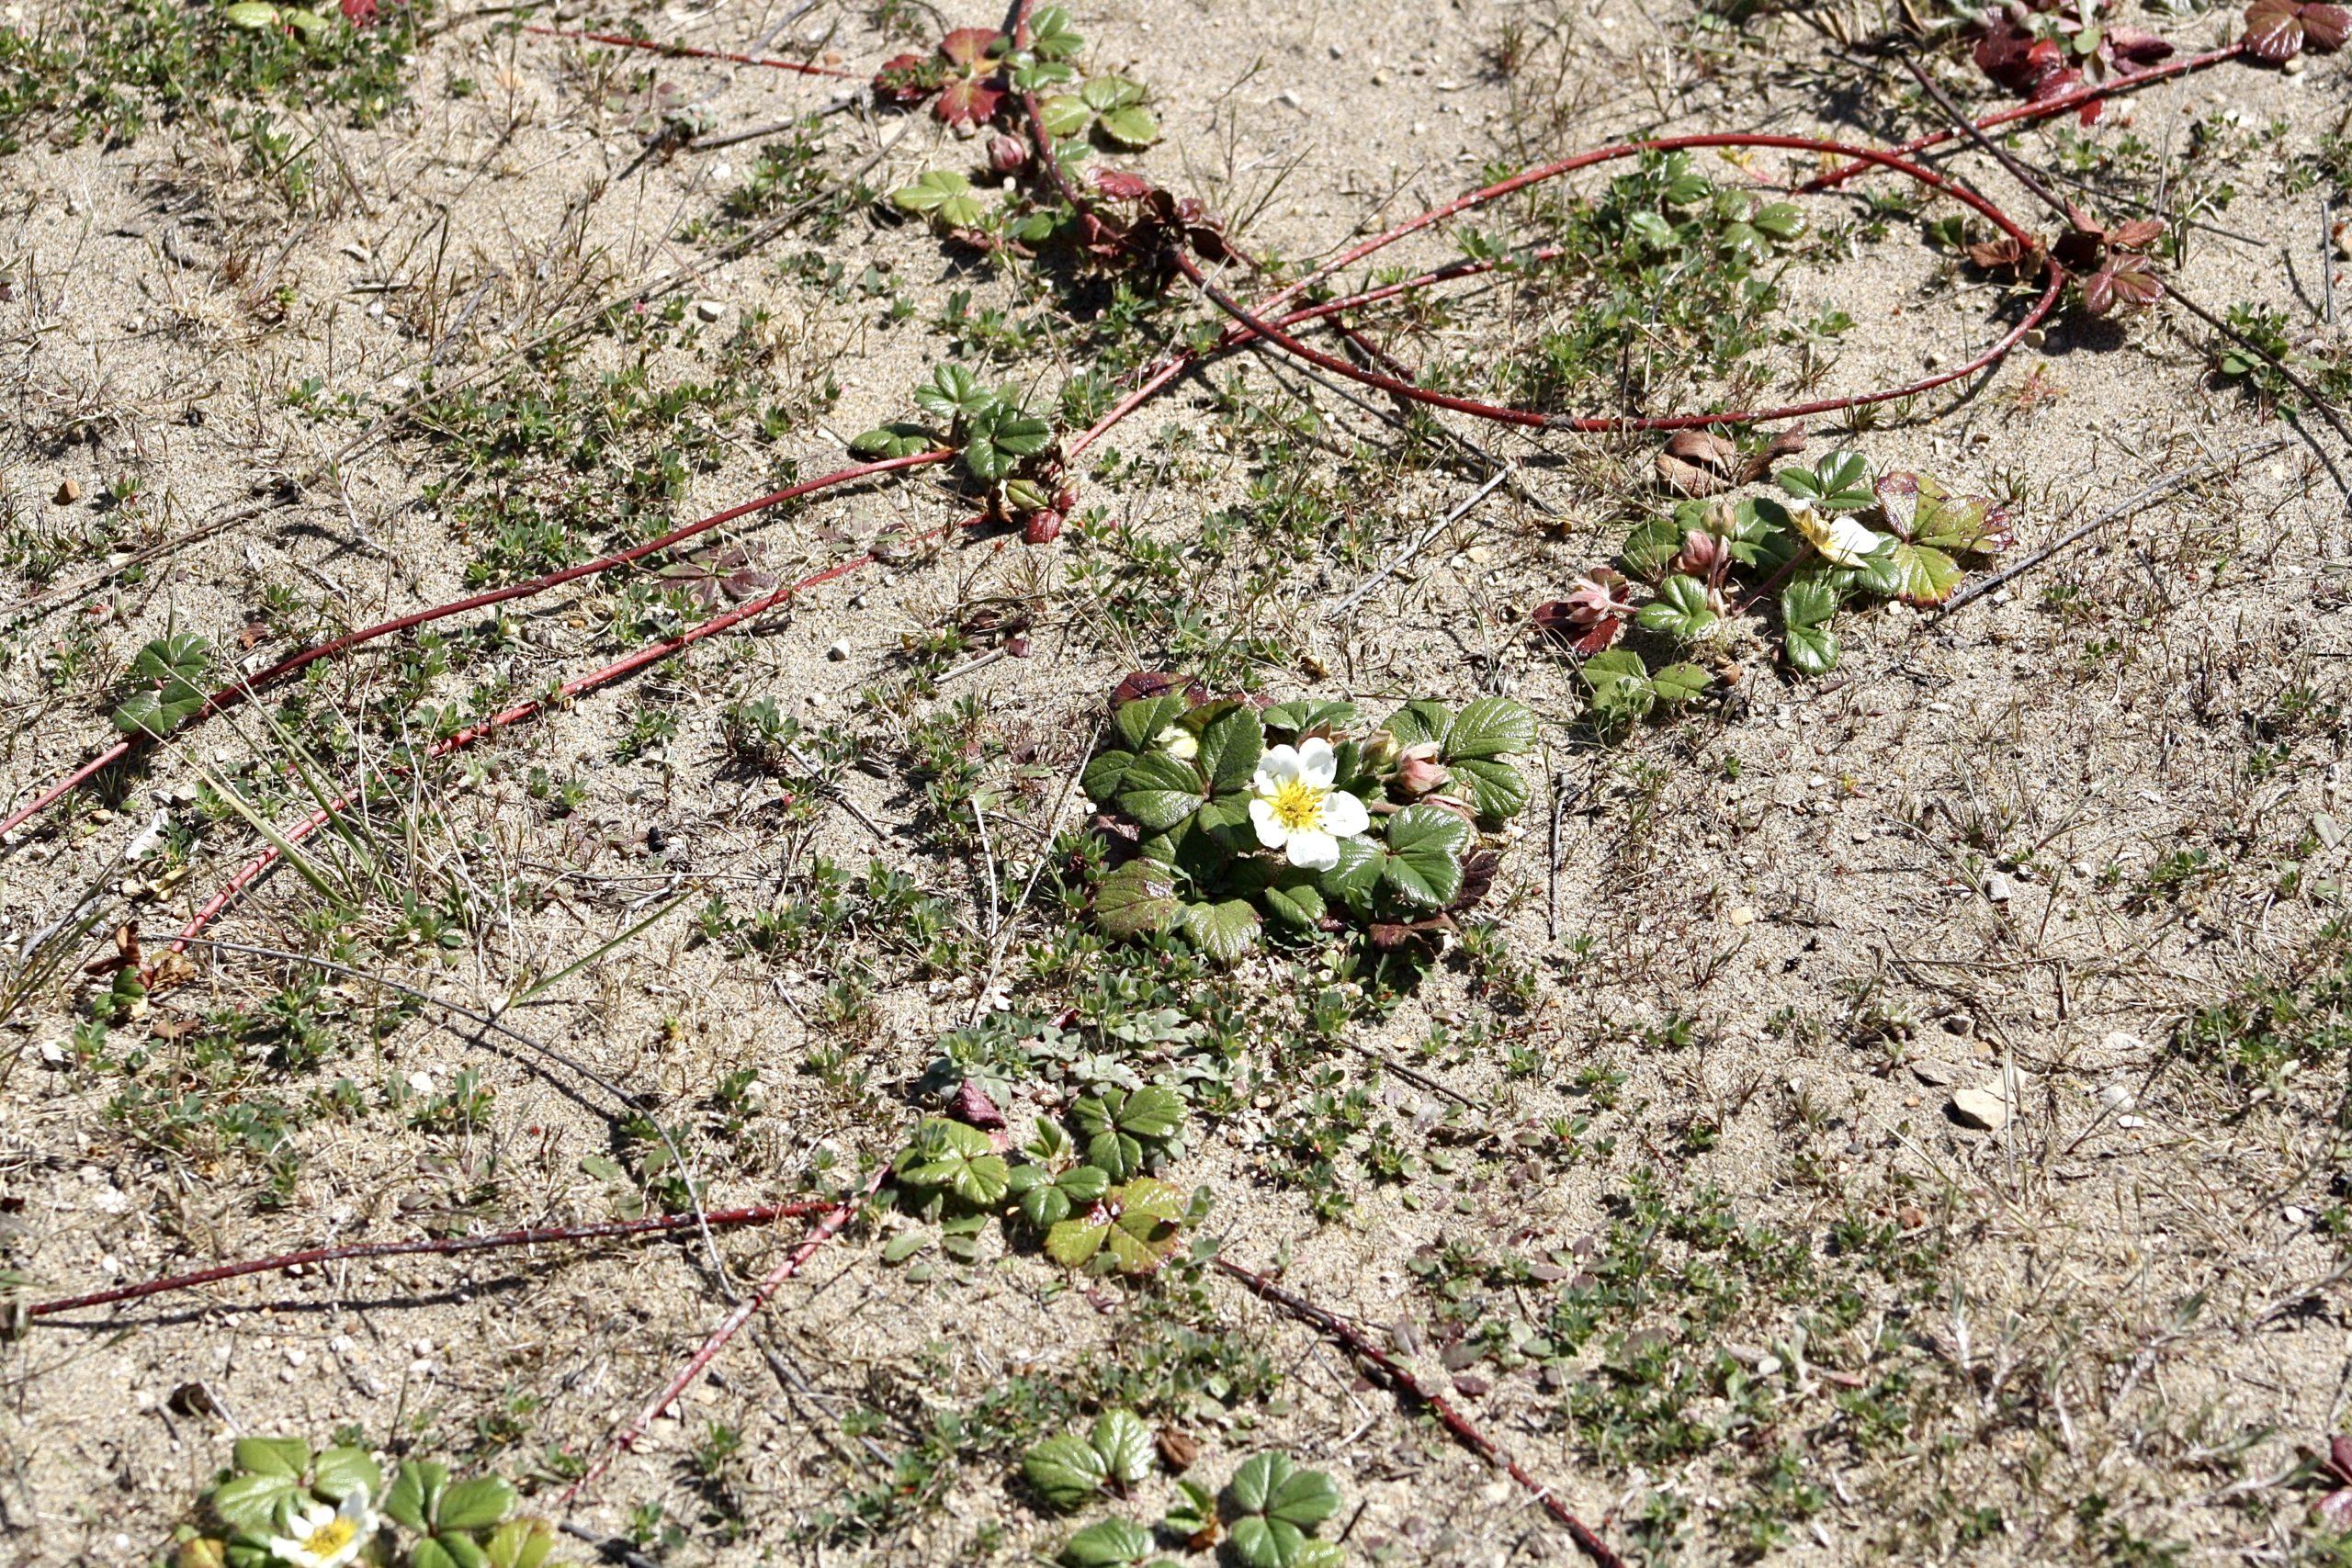 Fragaria chiloensis